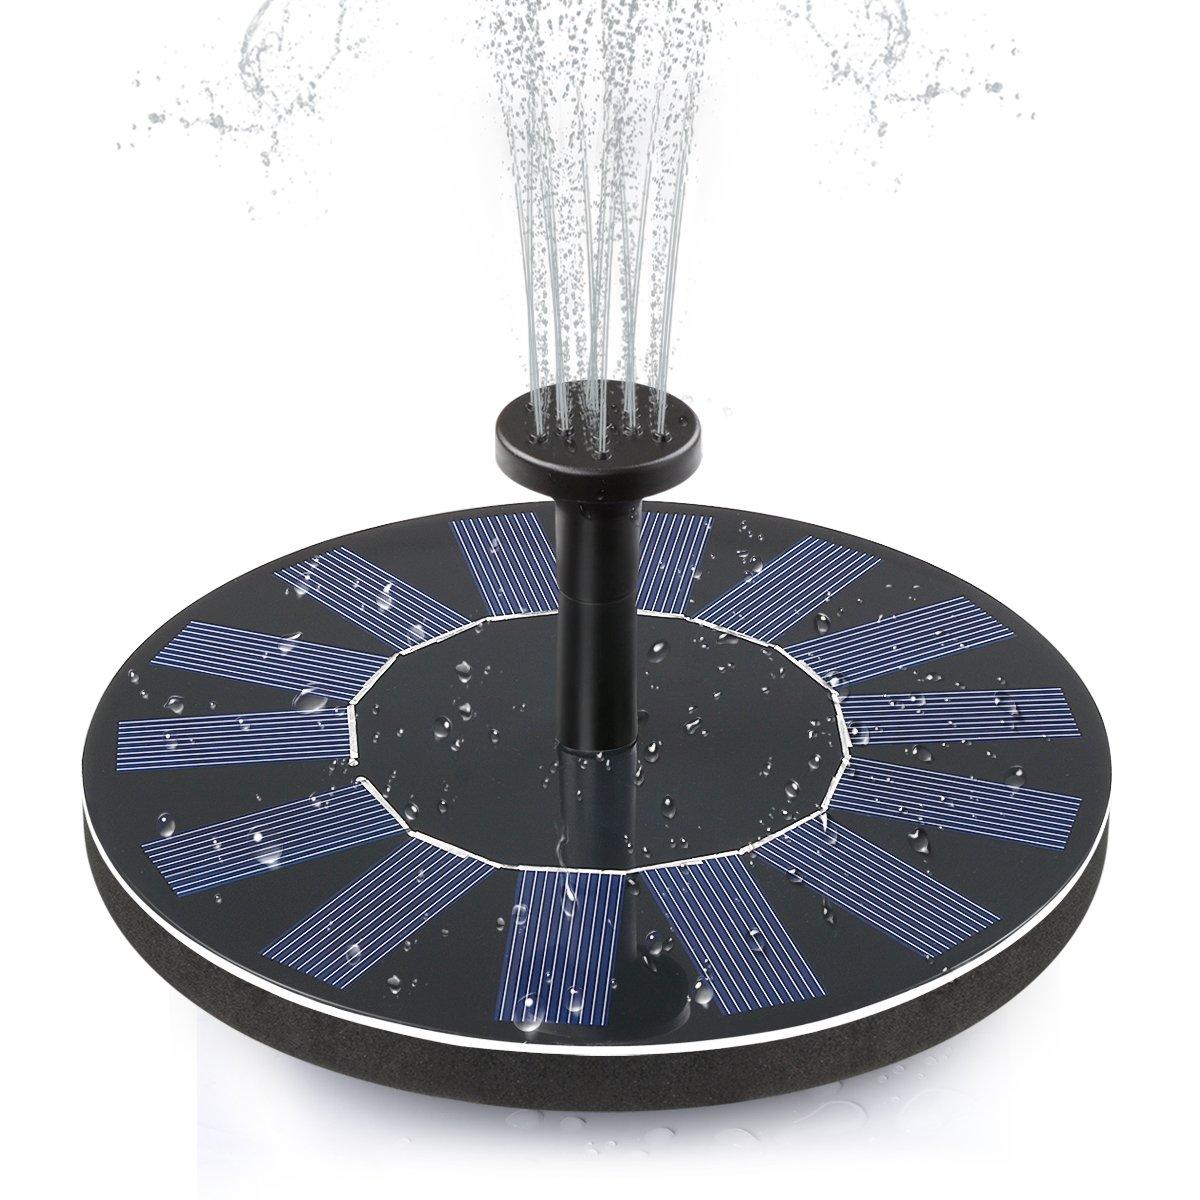 ADDTOP Solar Bird Bath Fountain Pump 1.4W Free Standing Solar Panel Kit Water Pump for Garden, Pond, Pool by ADDTOP